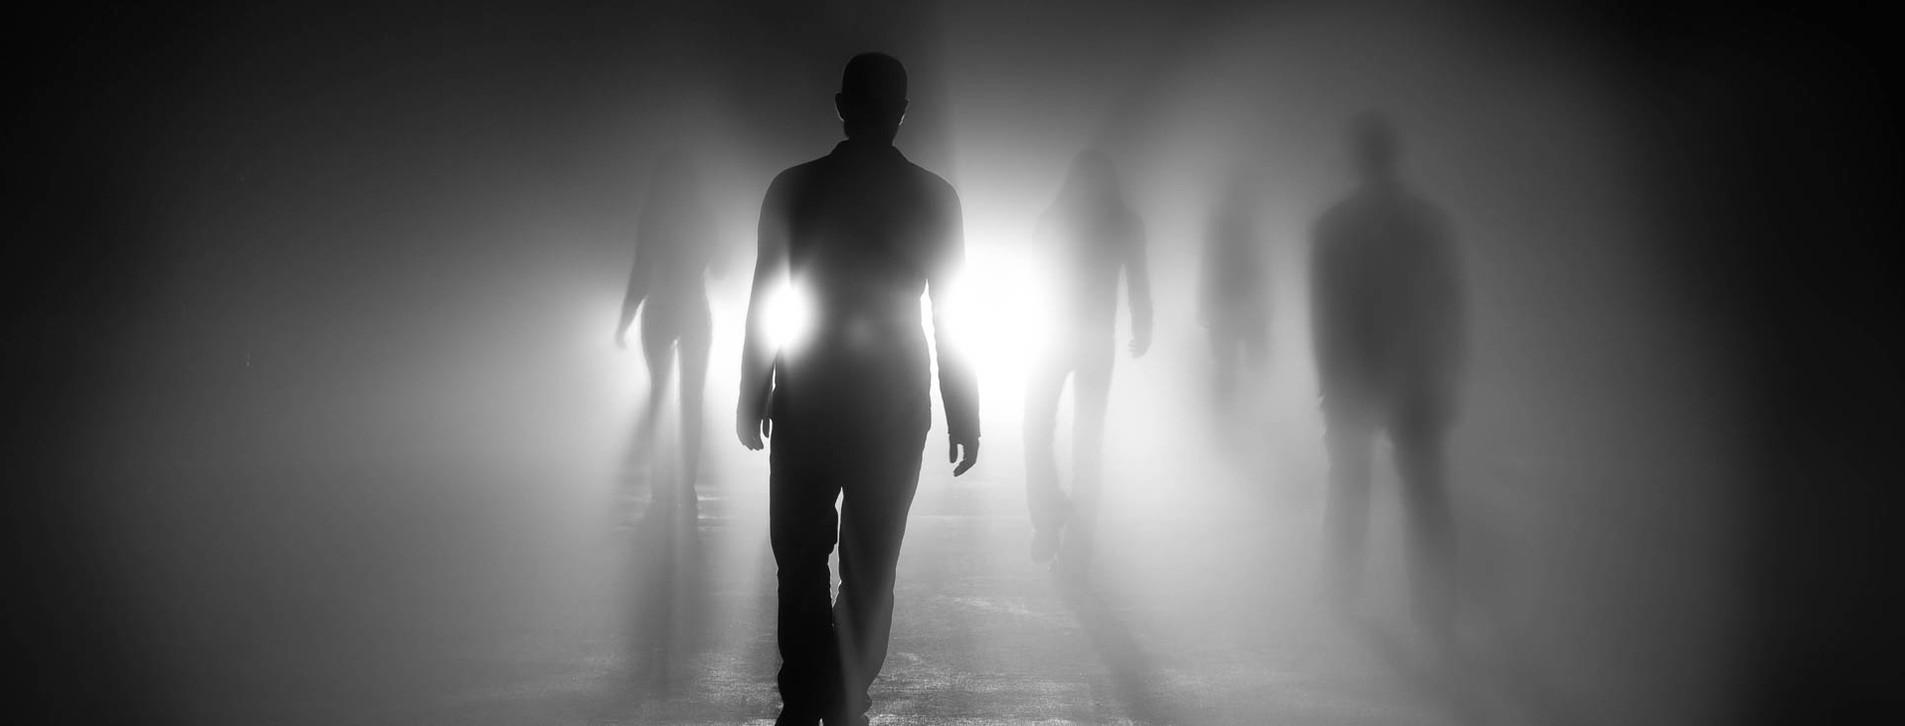 Фото - Квест в темноте для компании